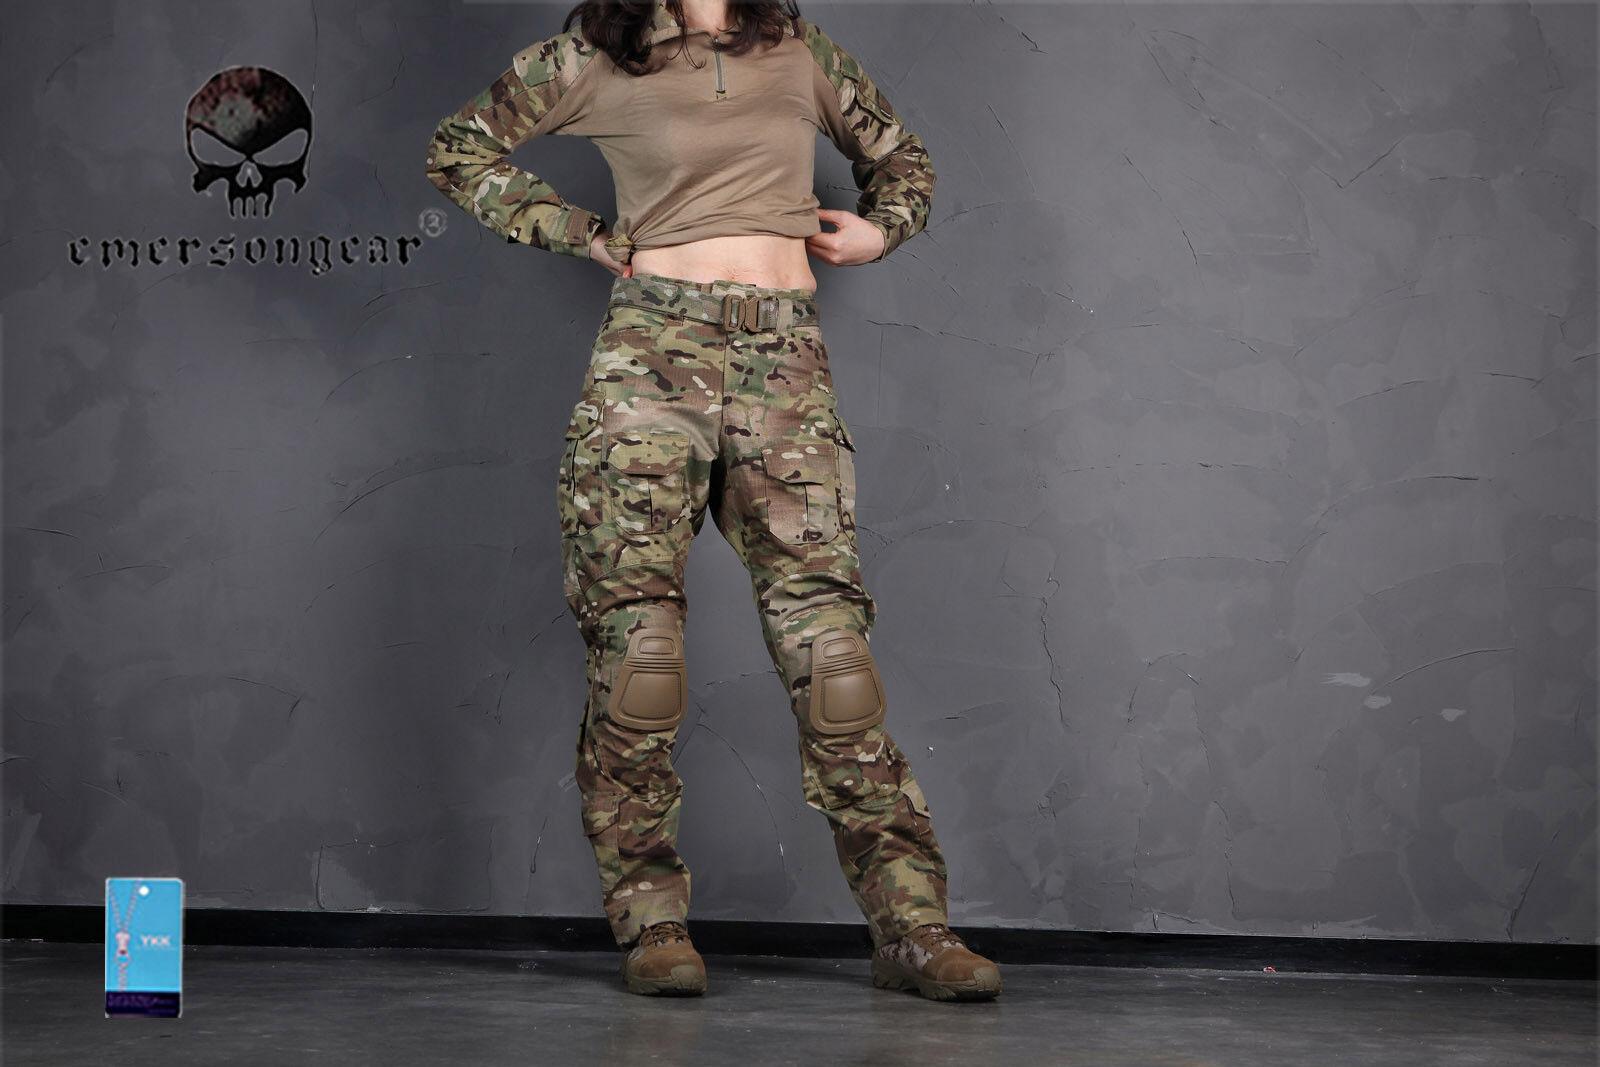 Emerson Military Hunting BDU  G3 Combat Uniform Woman Shirt & Pants MultiCam  limited edition